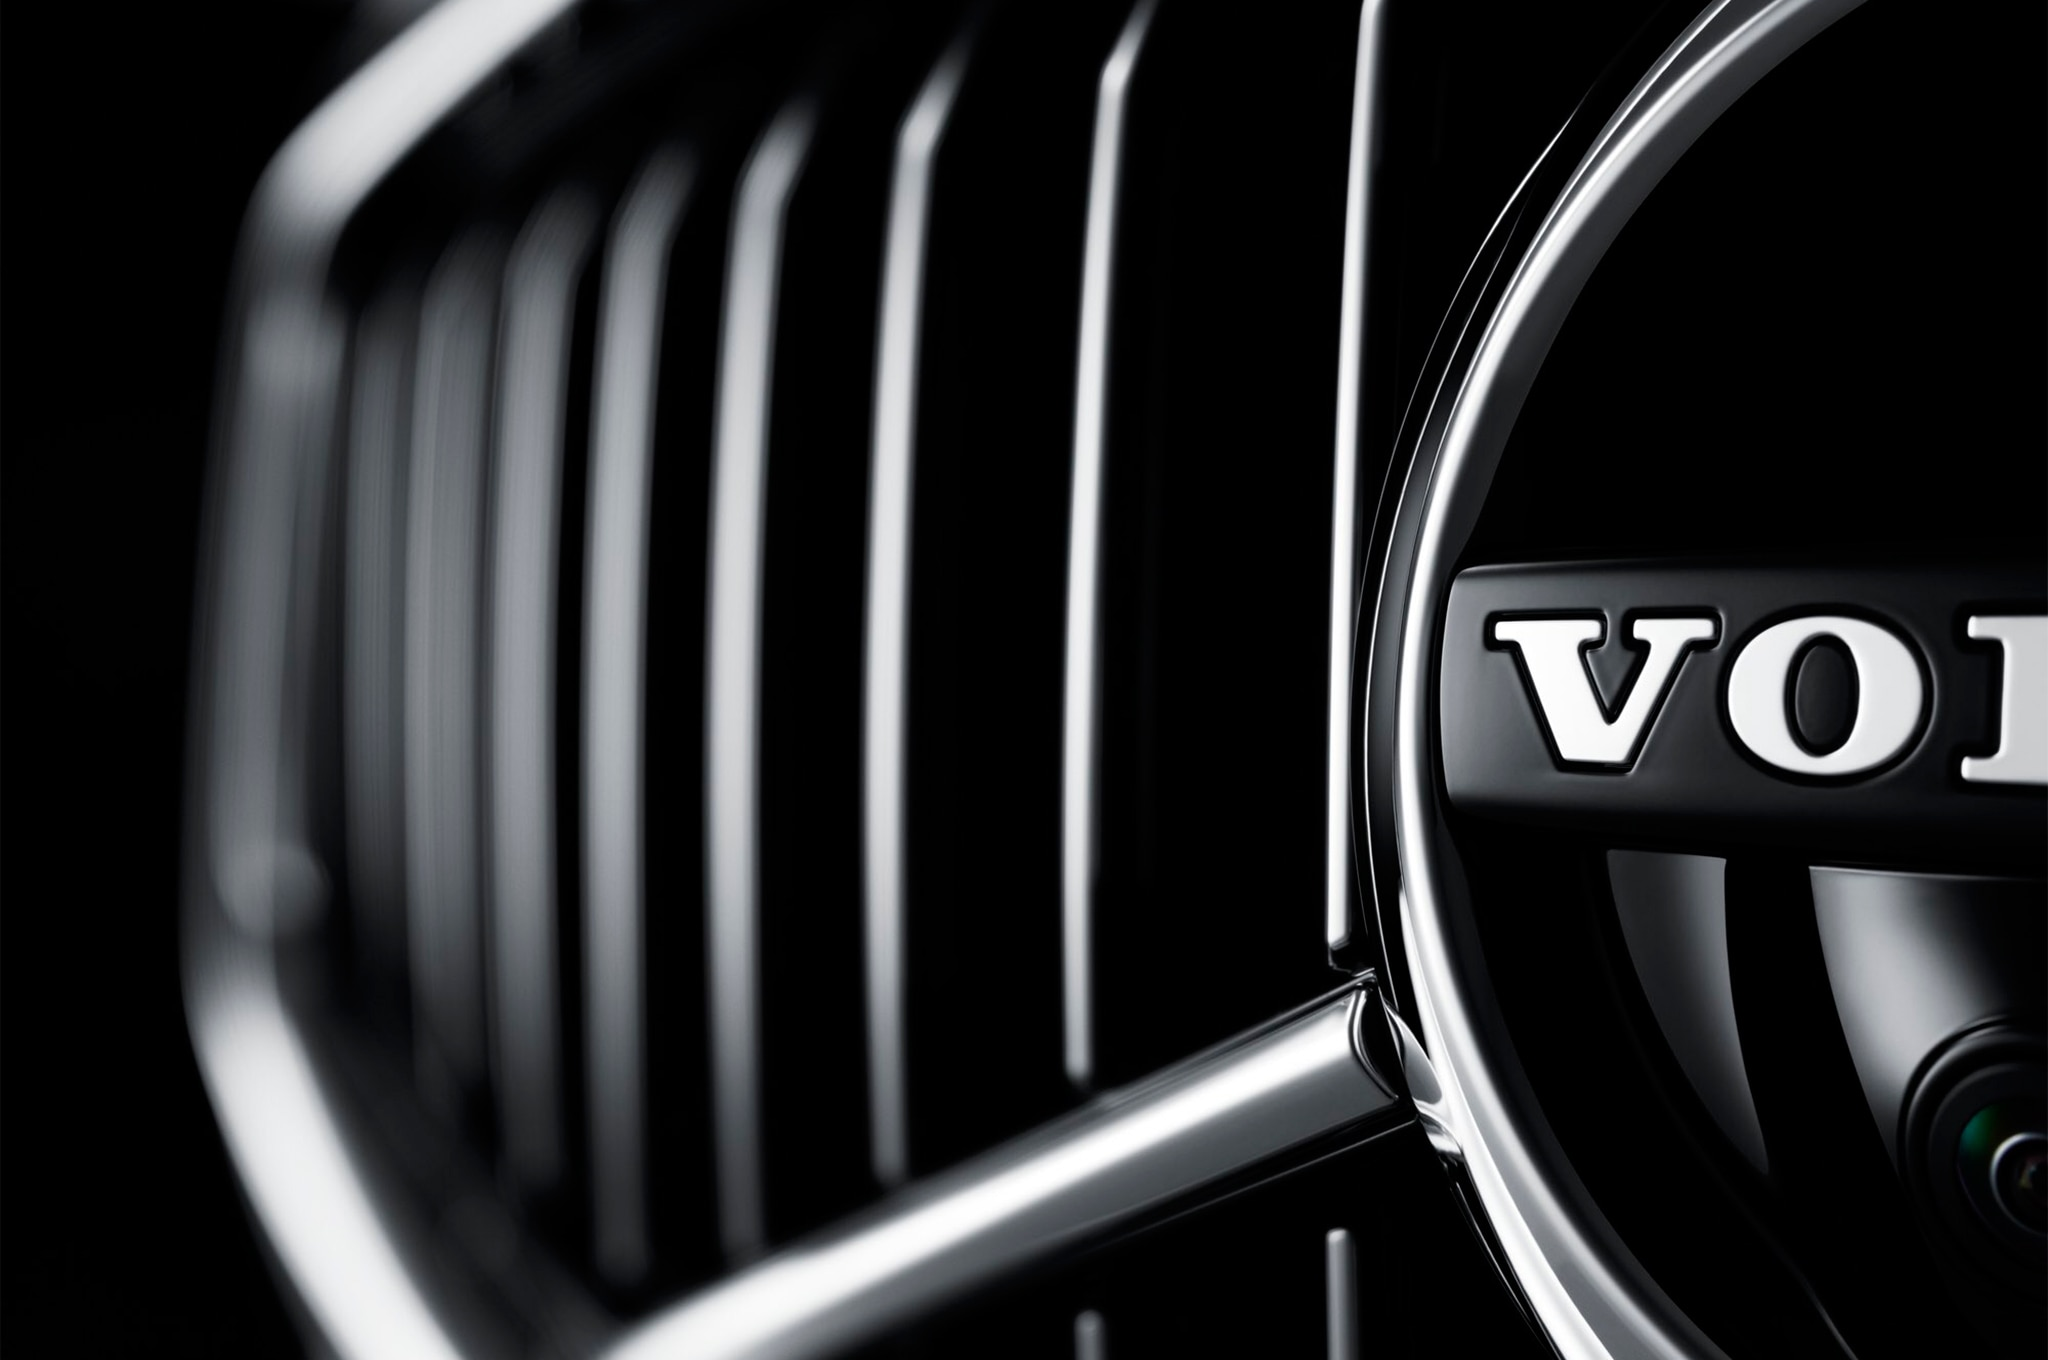 Volvo XC60 grille teaser